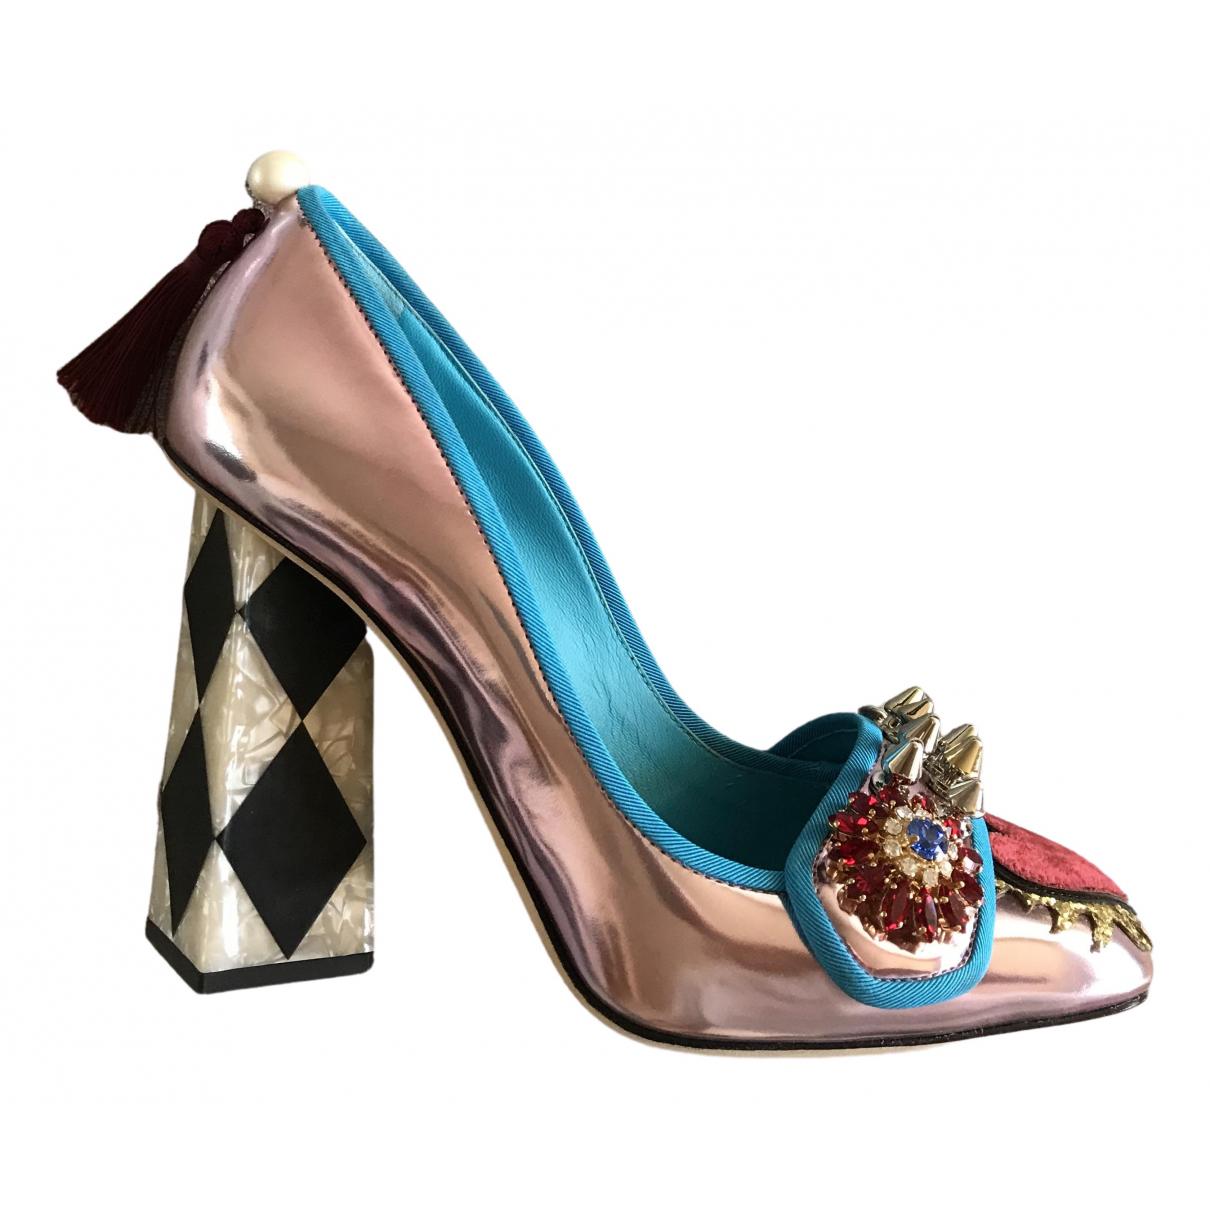 Tacones de Charol Dolce & Gabbana